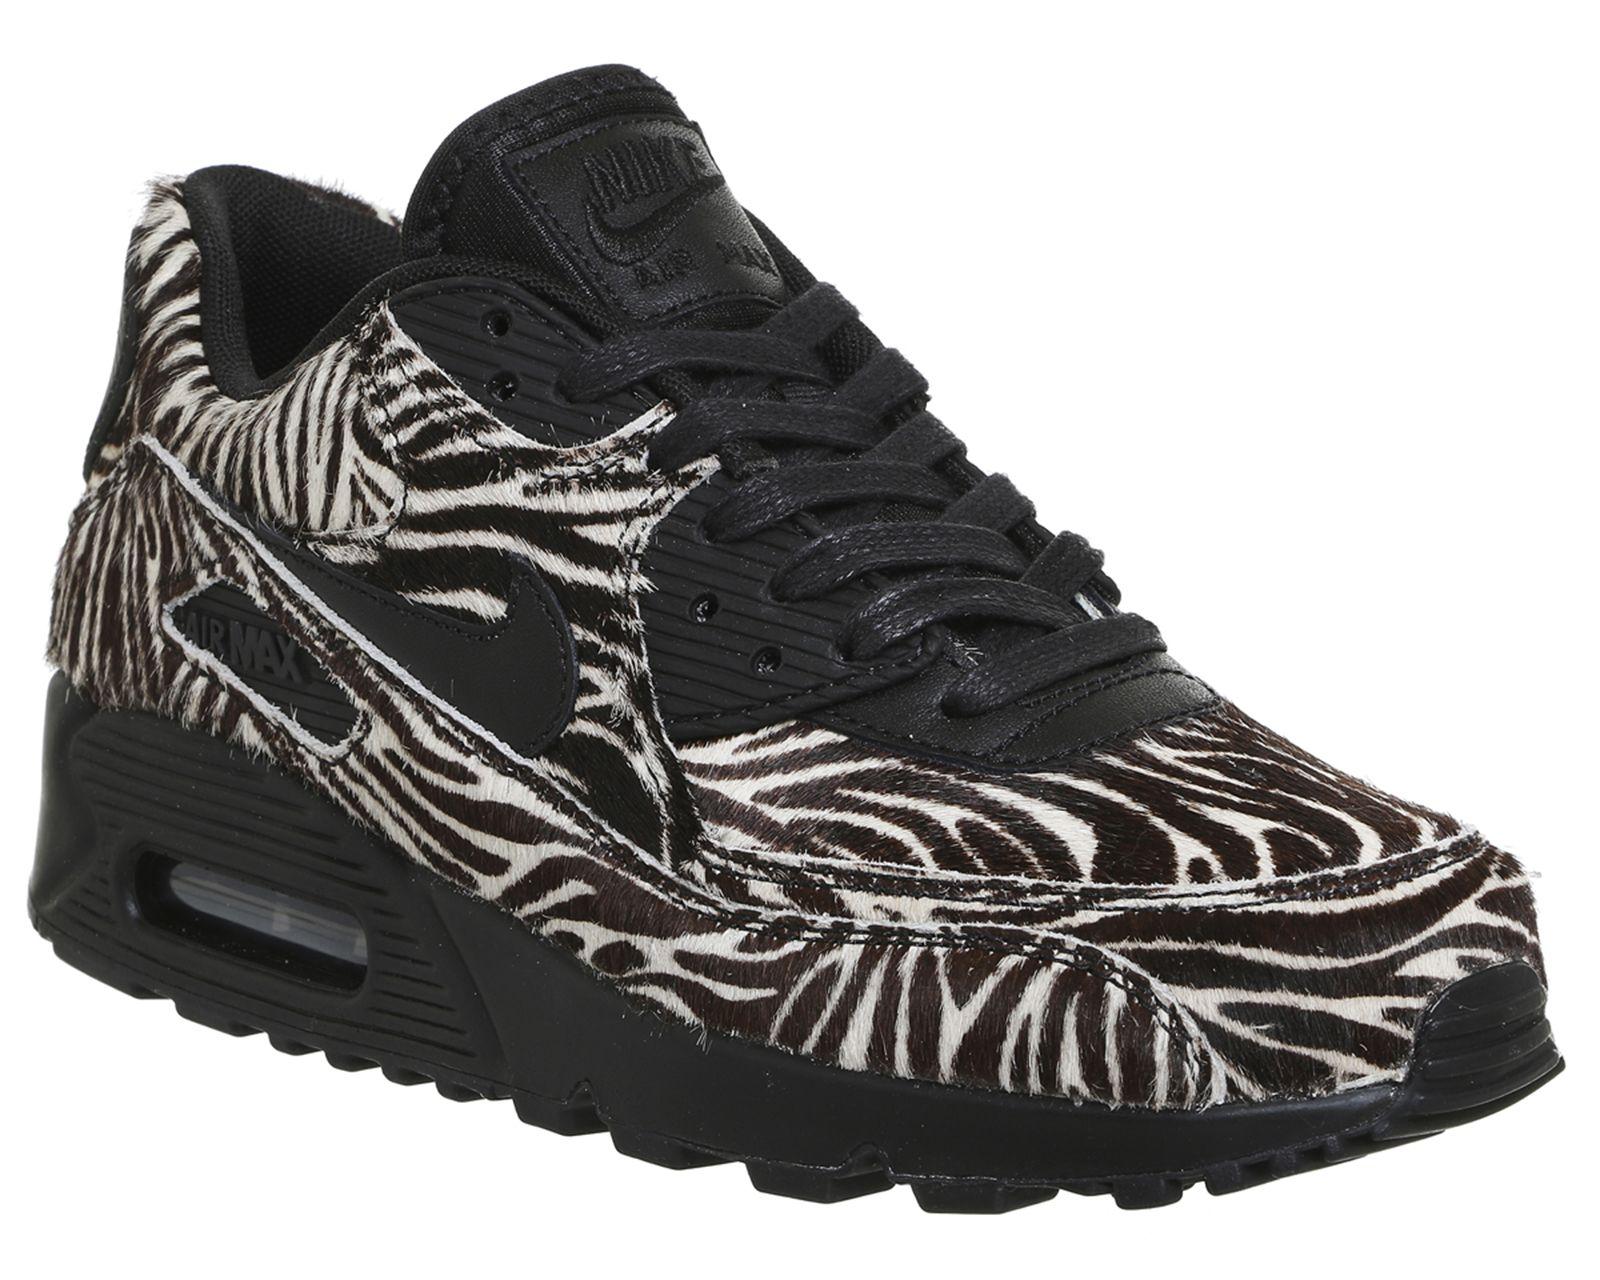 Nike Air Max 90 Zebra Black Sail